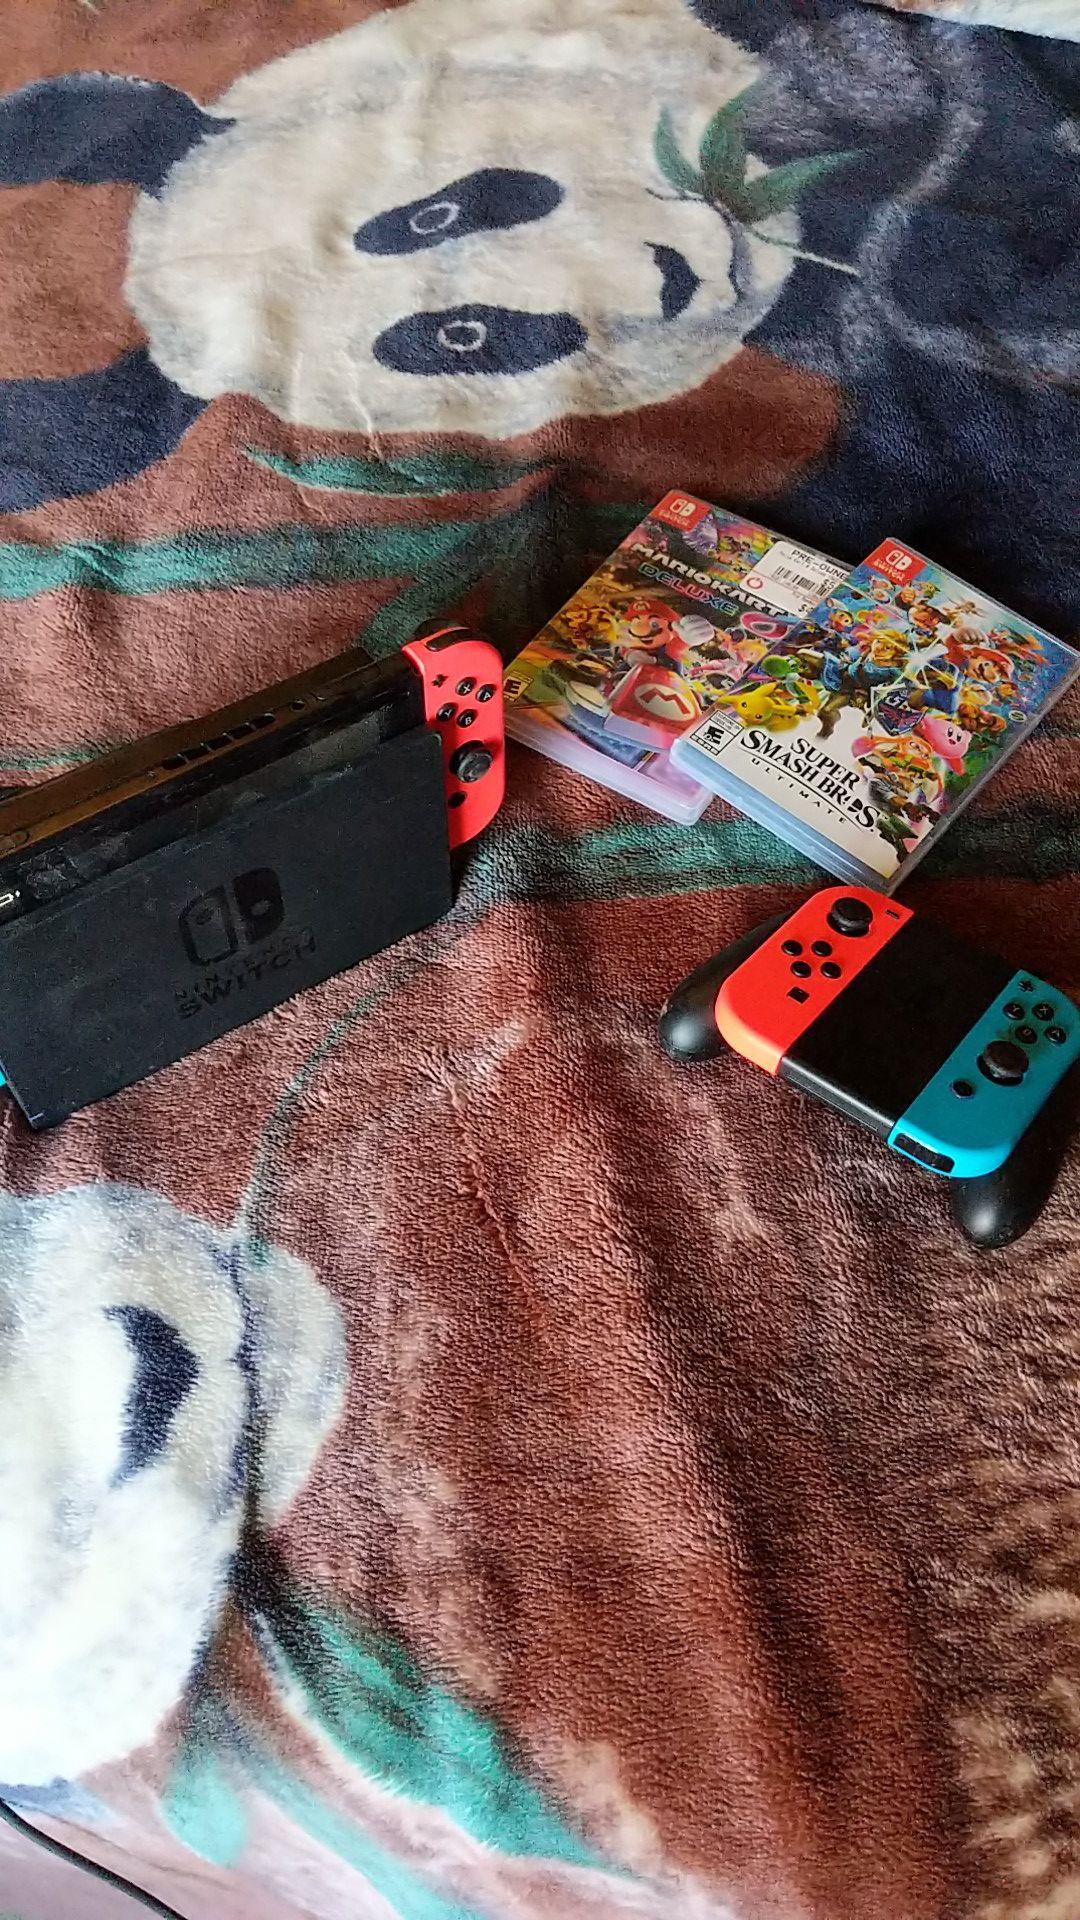 Nintendo Switch w/ Extra Joy Cons and Smash/MarioKart